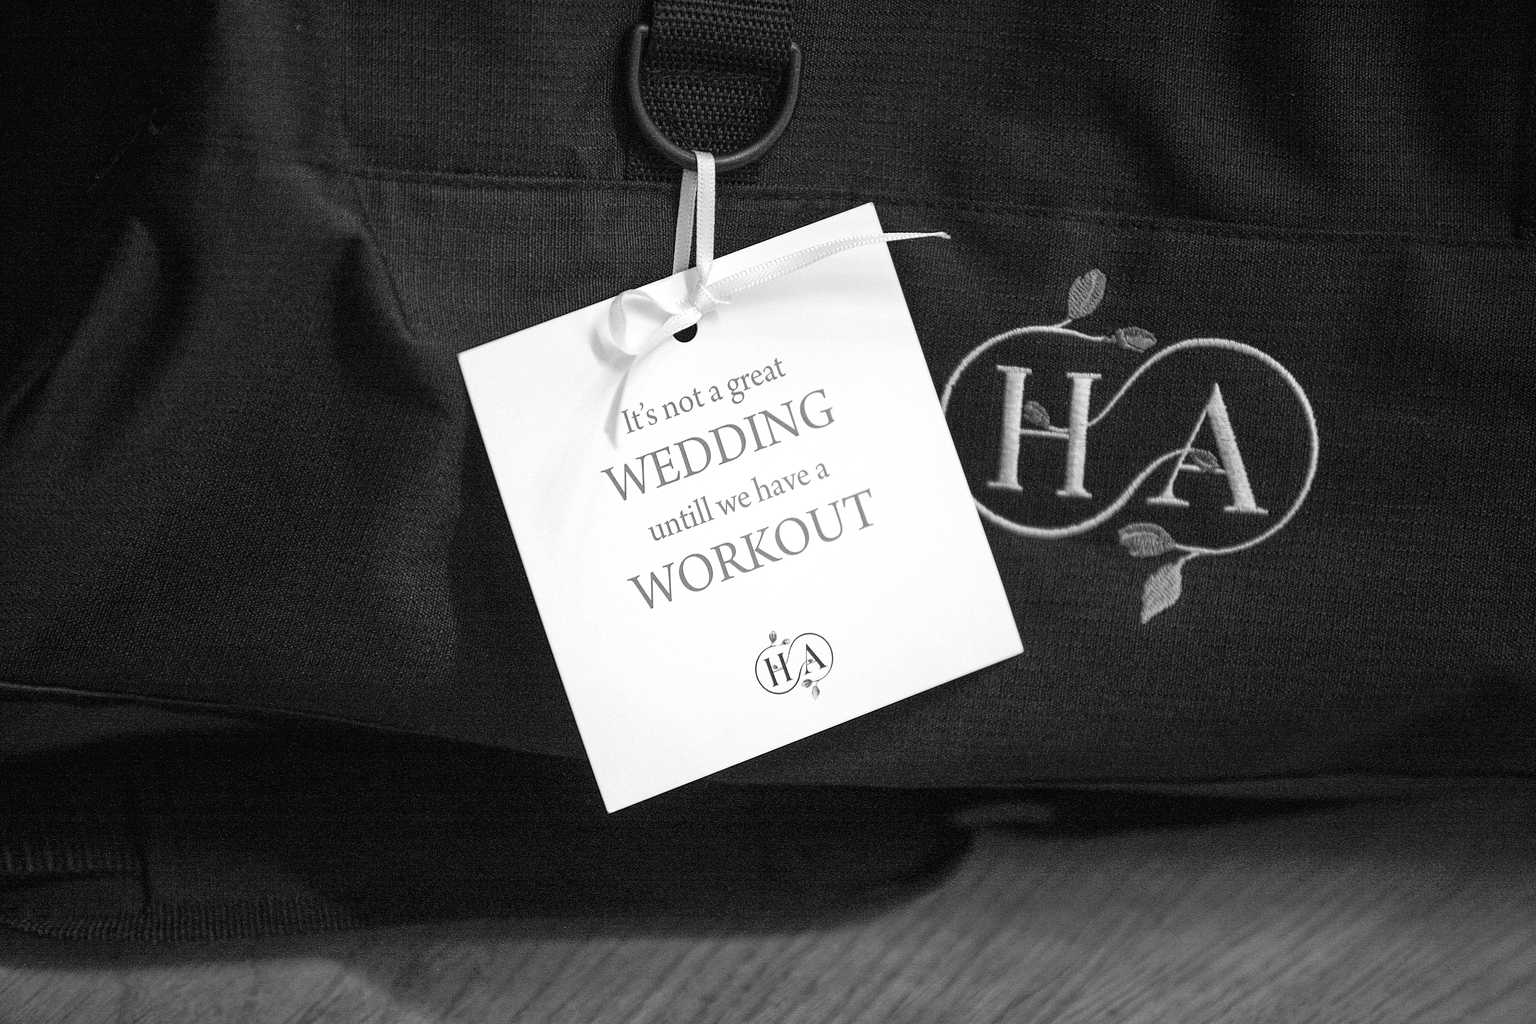 Wedding en Planning |weddingplanner | wedding workout for the men | Winterwedding | fotocredits Karen Kaper